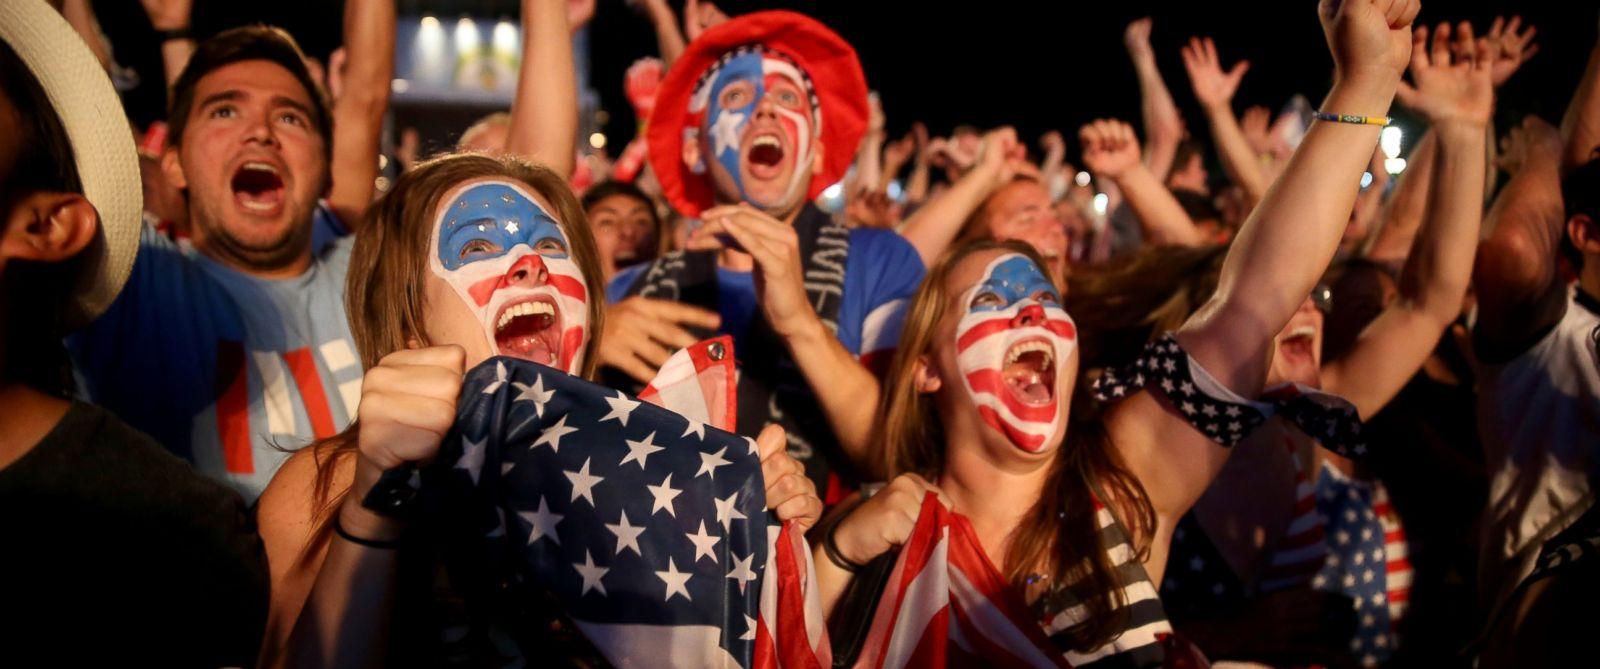 PHOTO: USA soccer fans react as their team scores their second goal against Portugal, June 22, 2014 in Rio de Janeiro, Brazil.